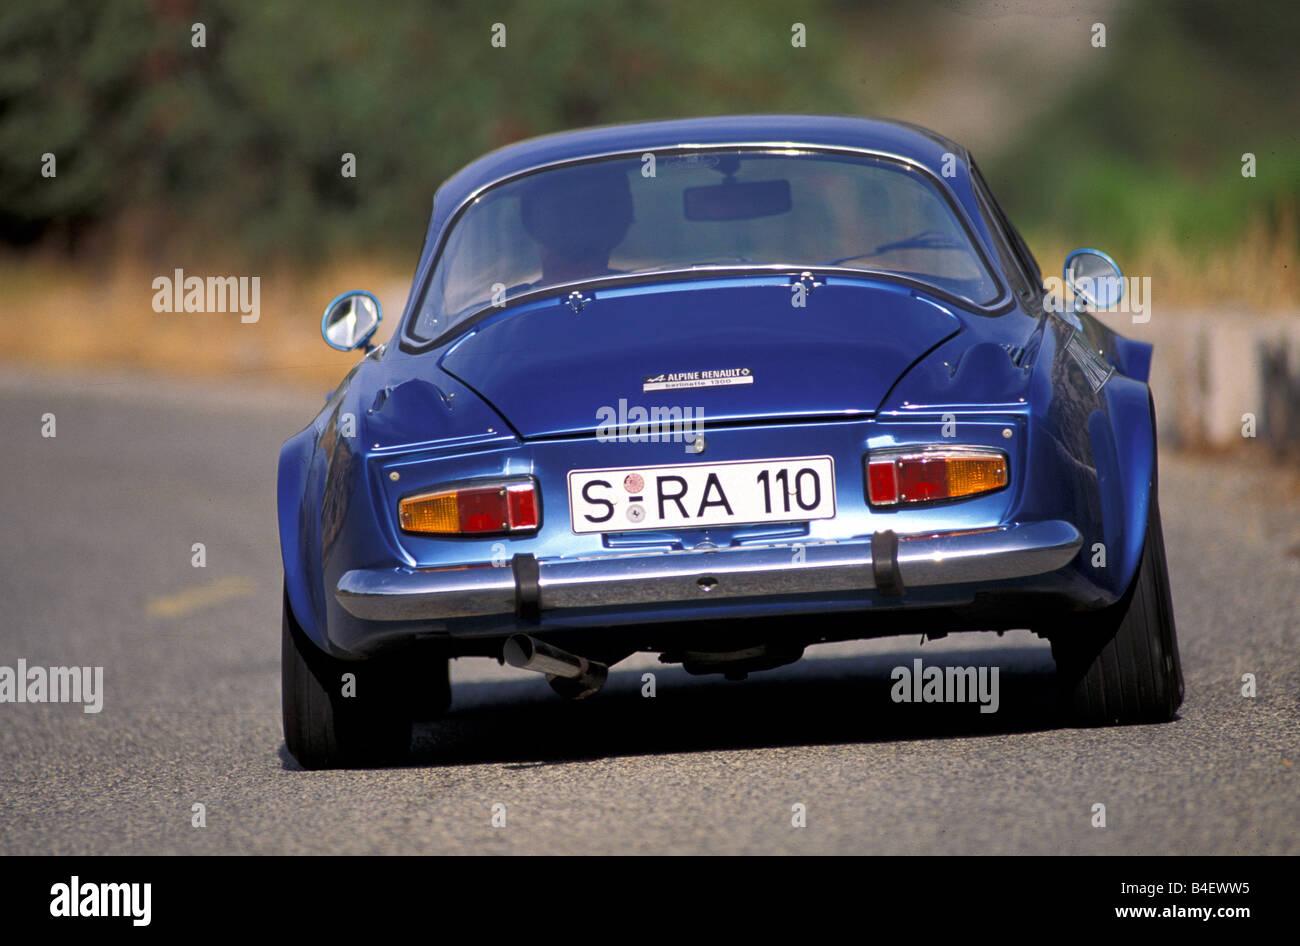 1962 renault alpine a110 - photo #43